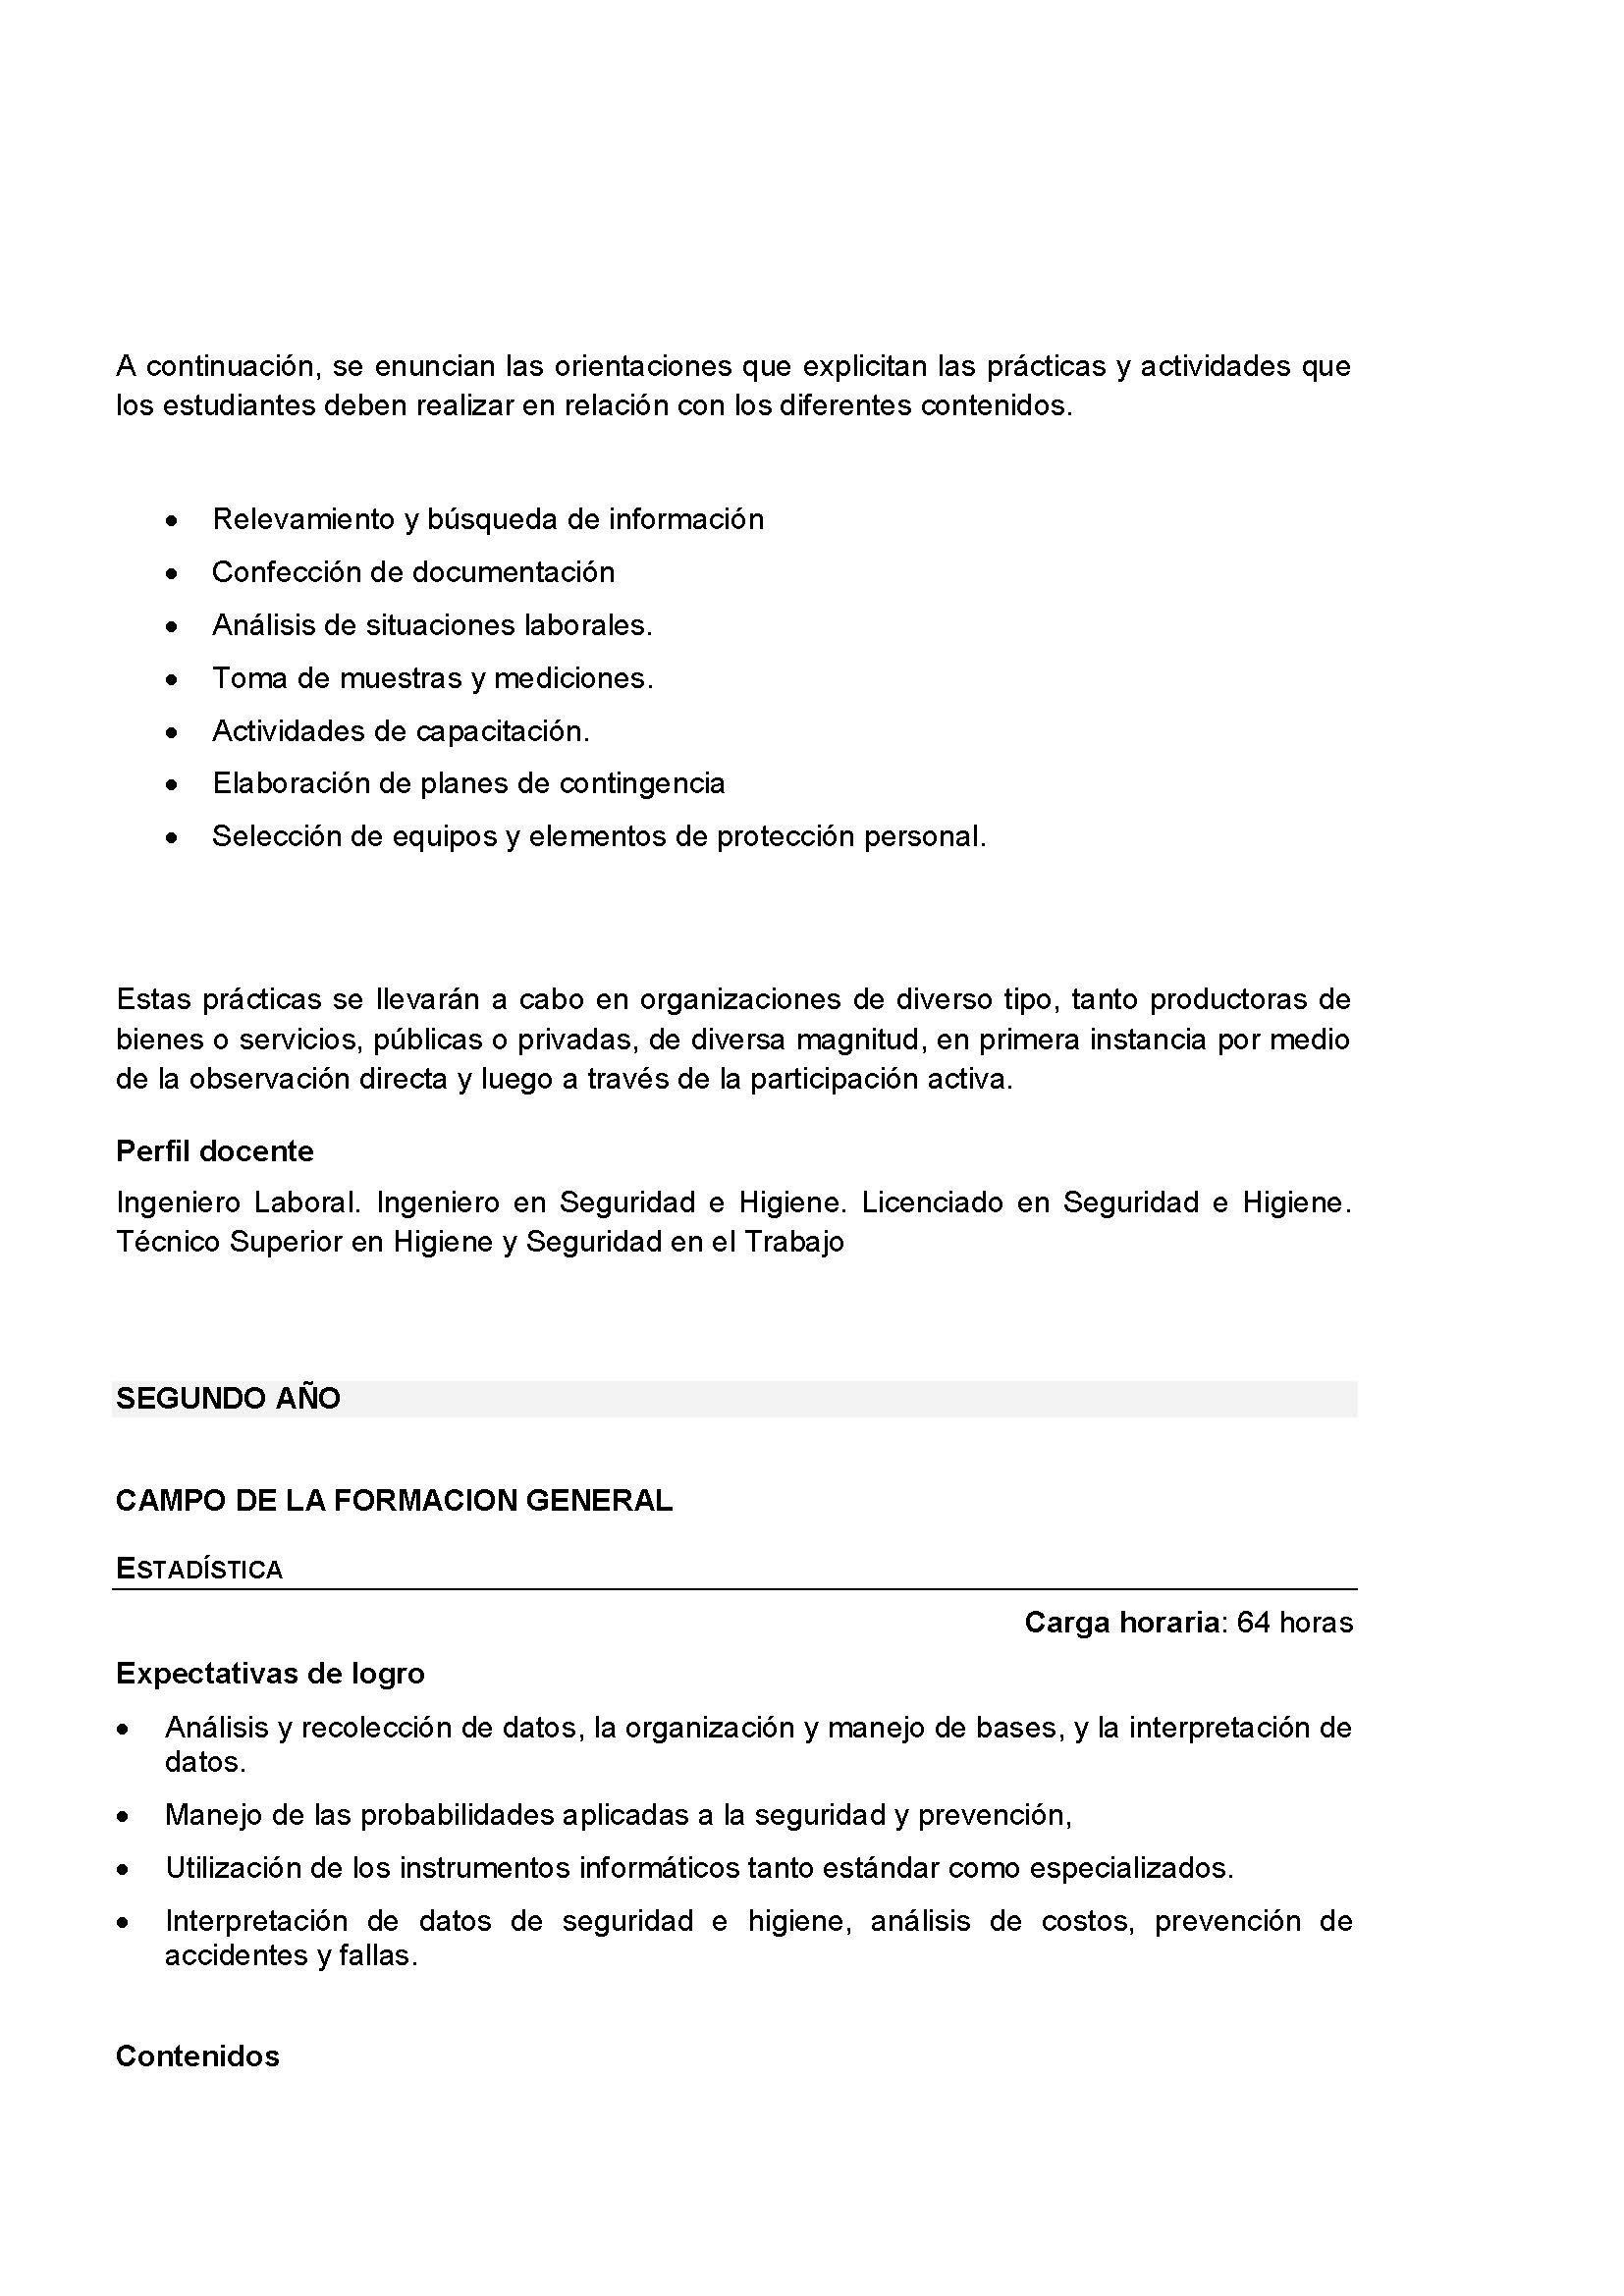 320-13 TS Seg e Hig Final (Plan Nuevo)_Page_18